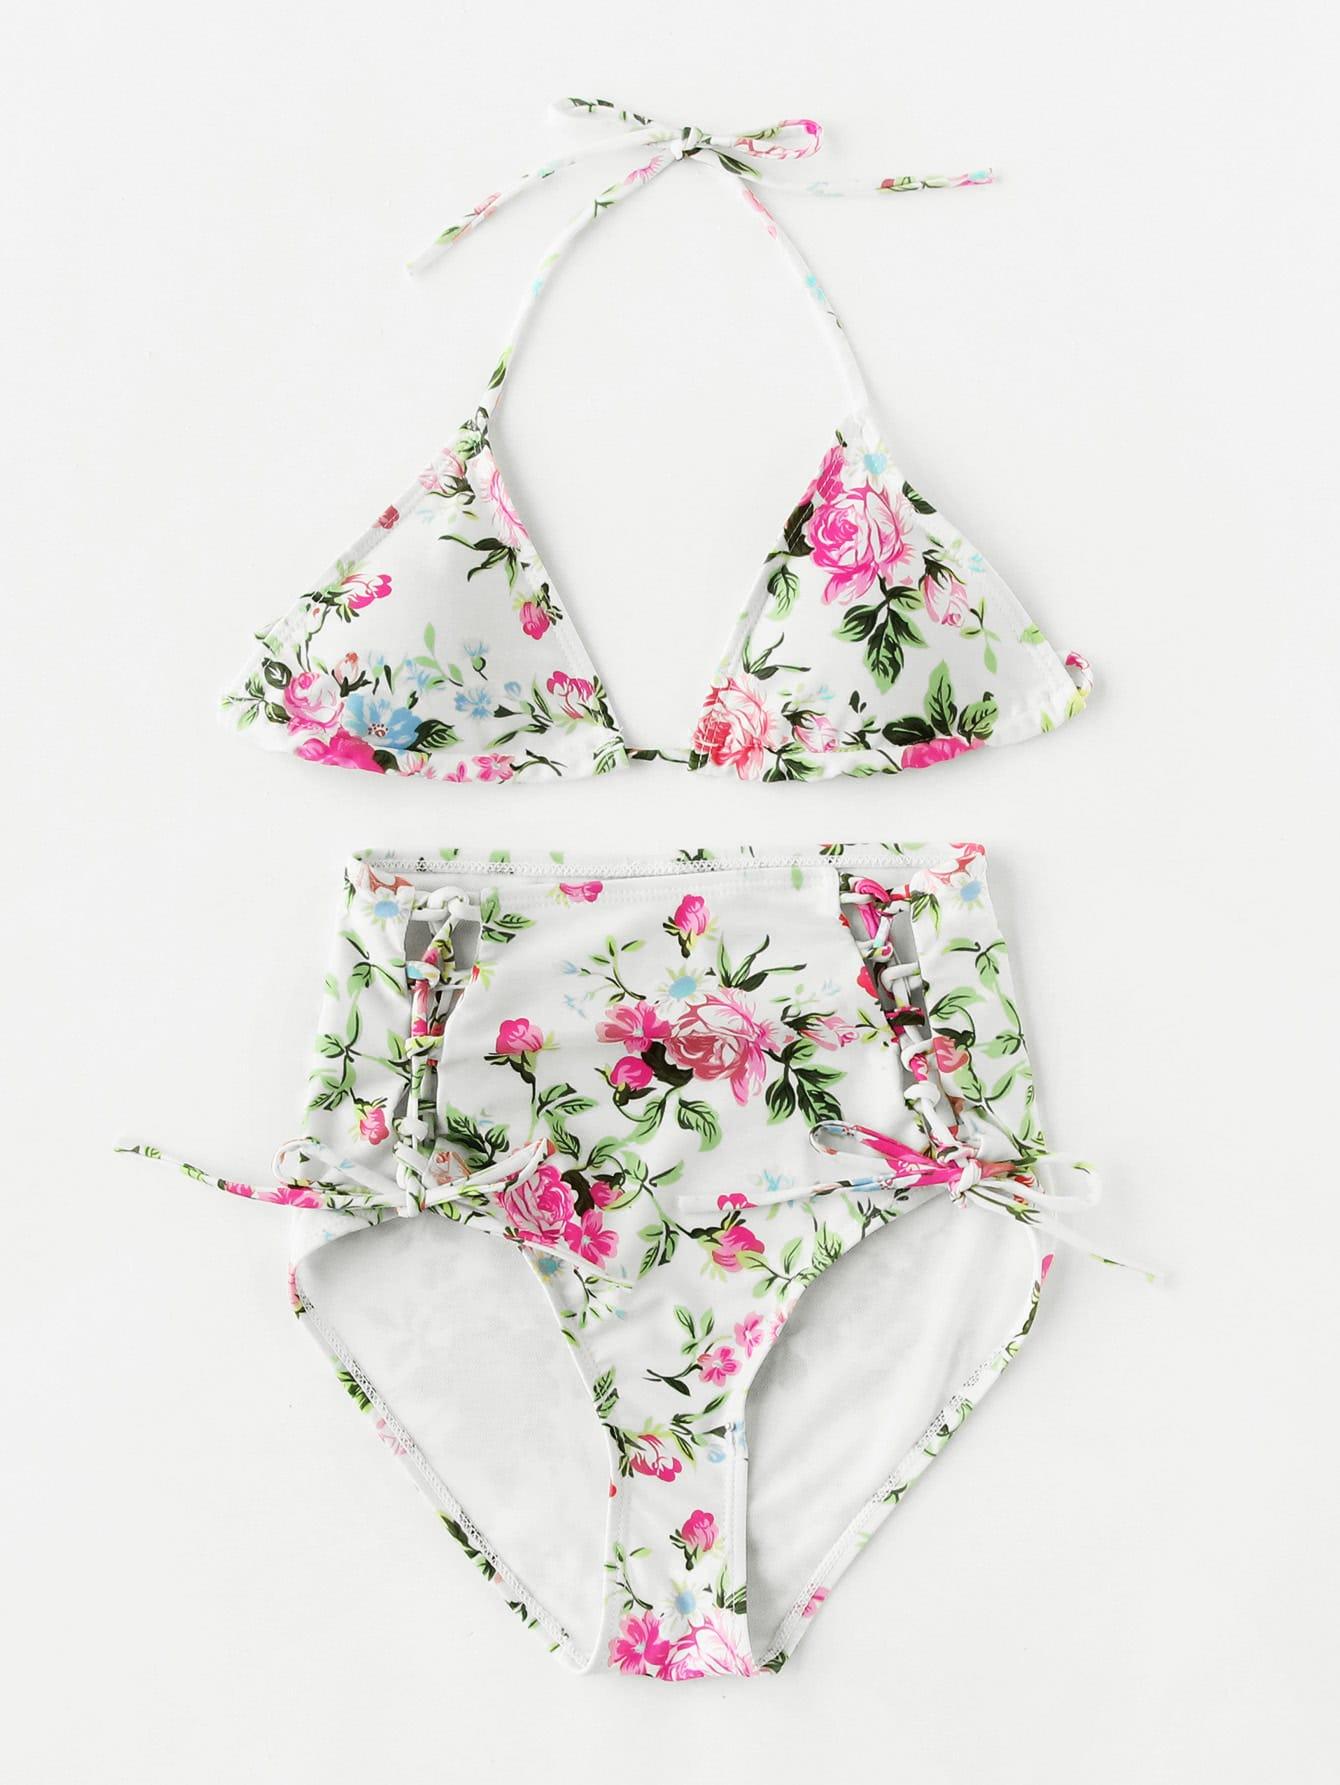 Фото Calico Print Lace Up High Waist Bikini Set. Купить с доставкой